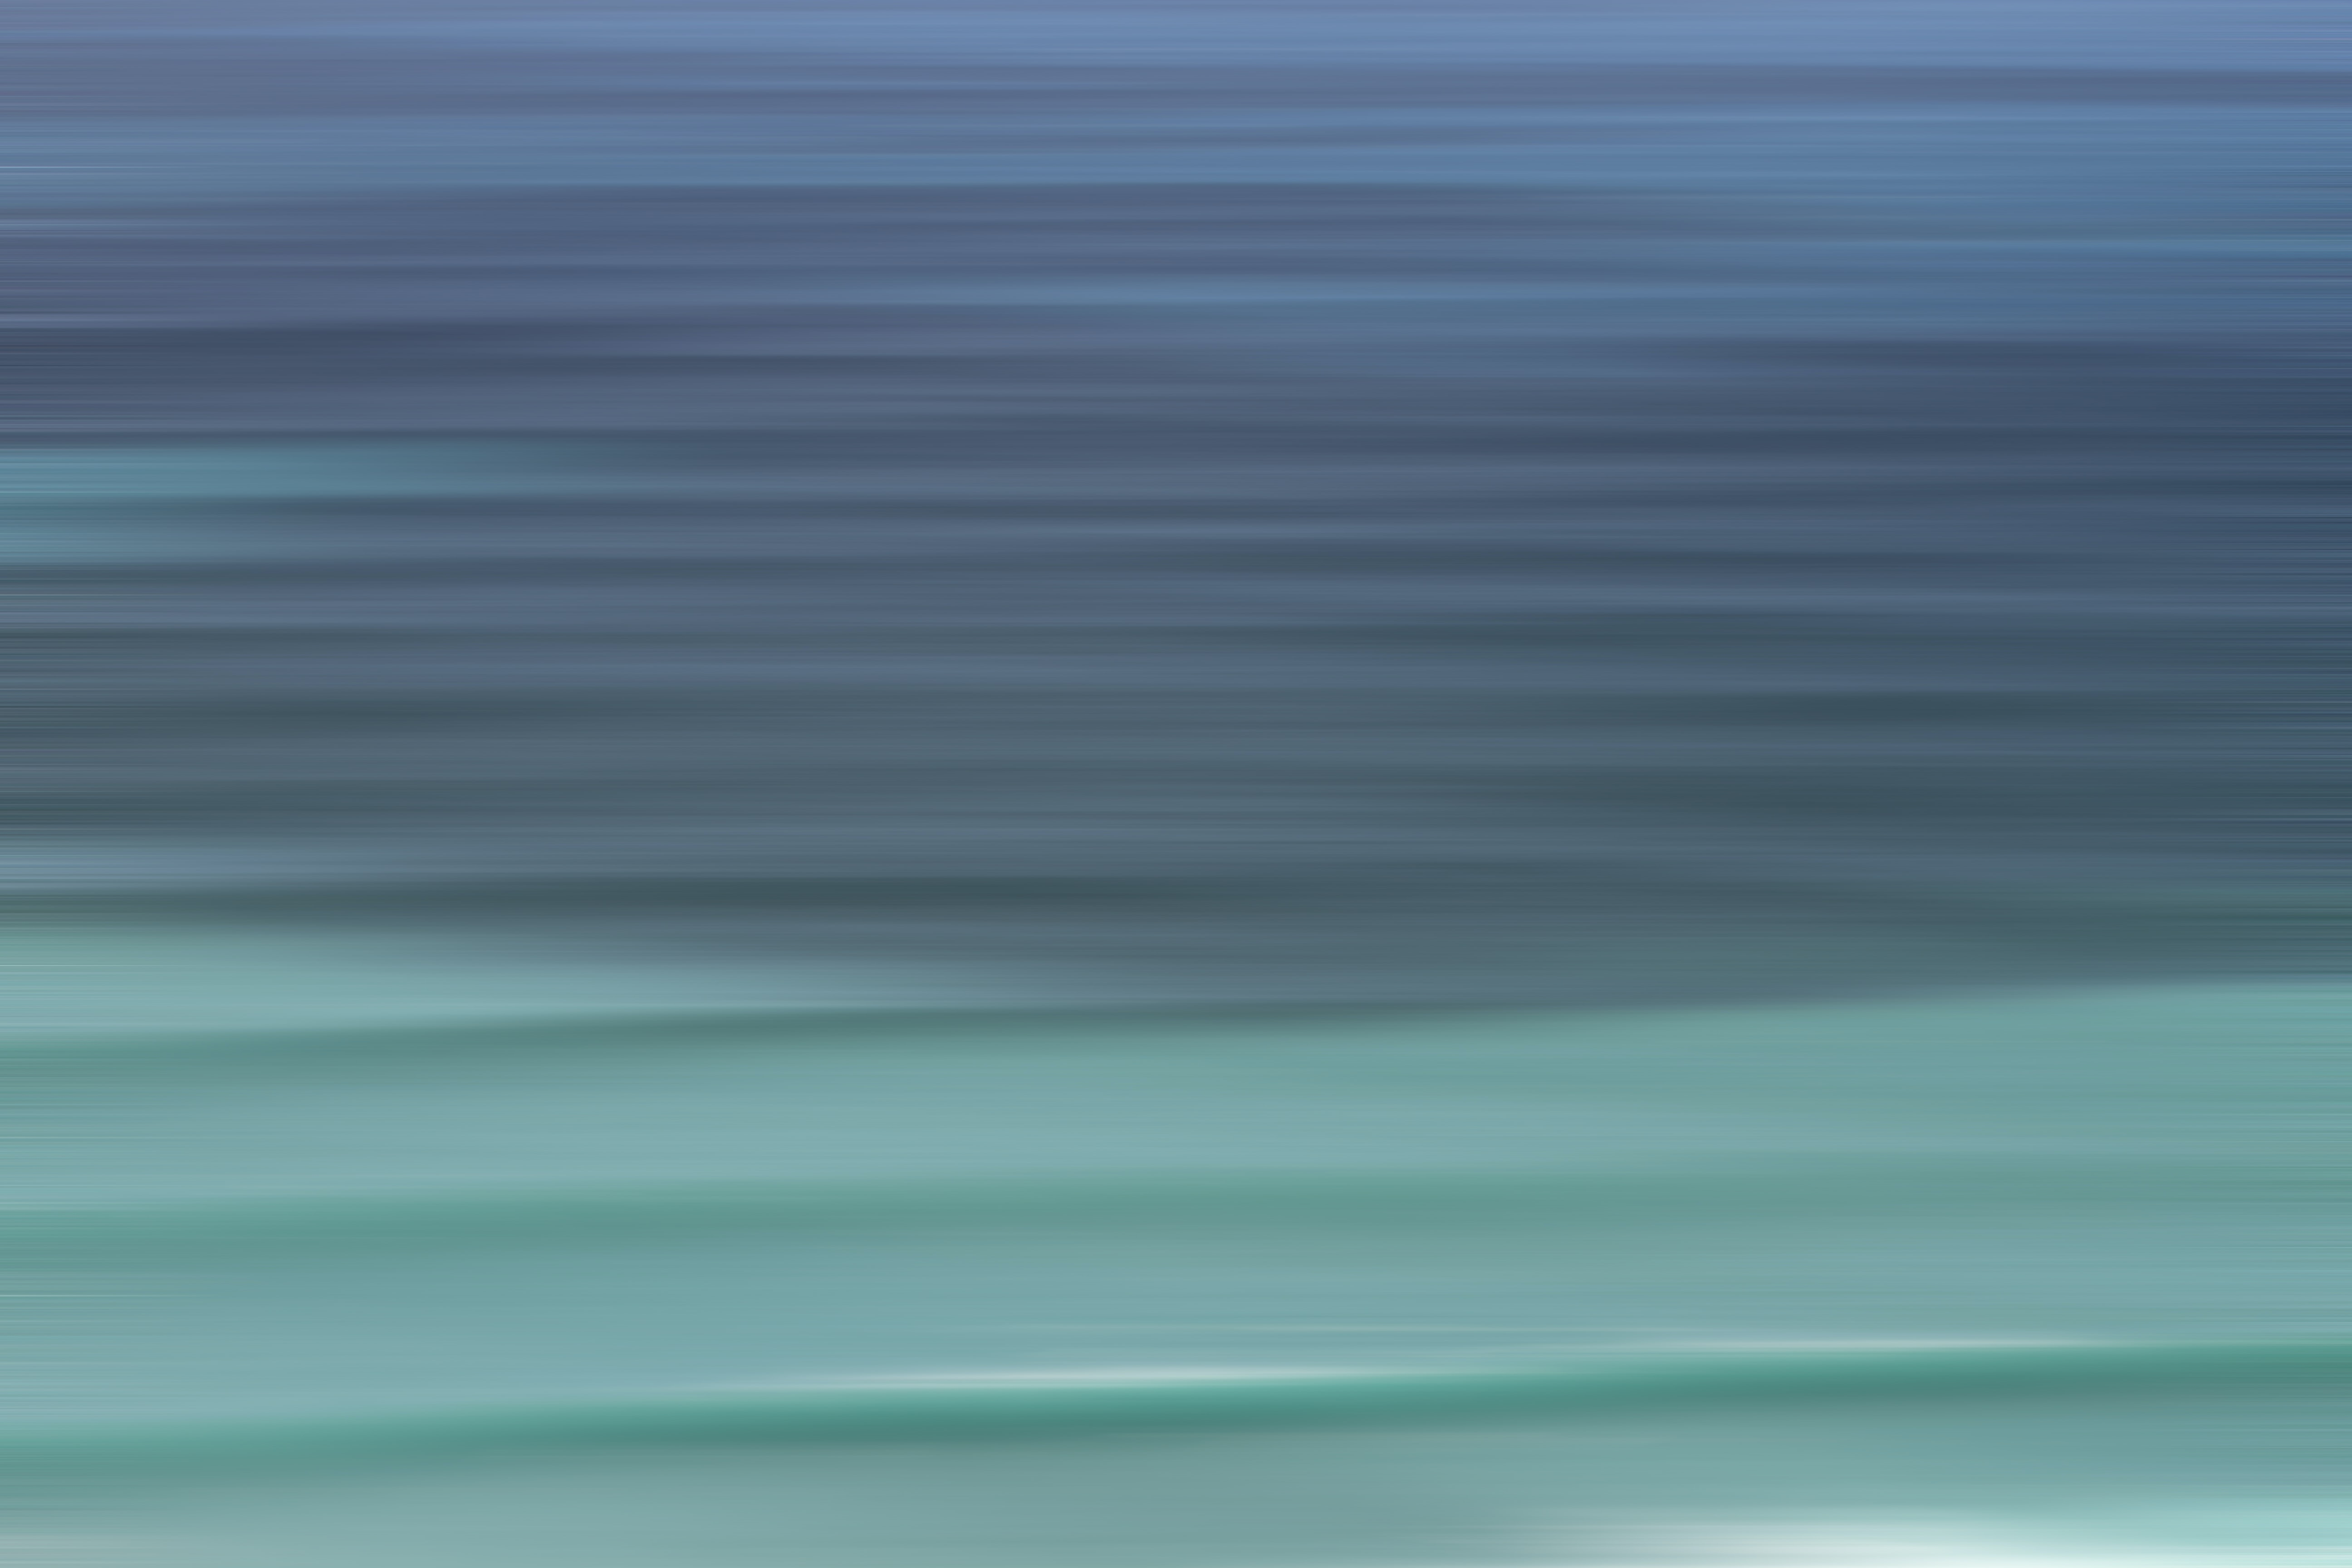 A blurred ocean image.